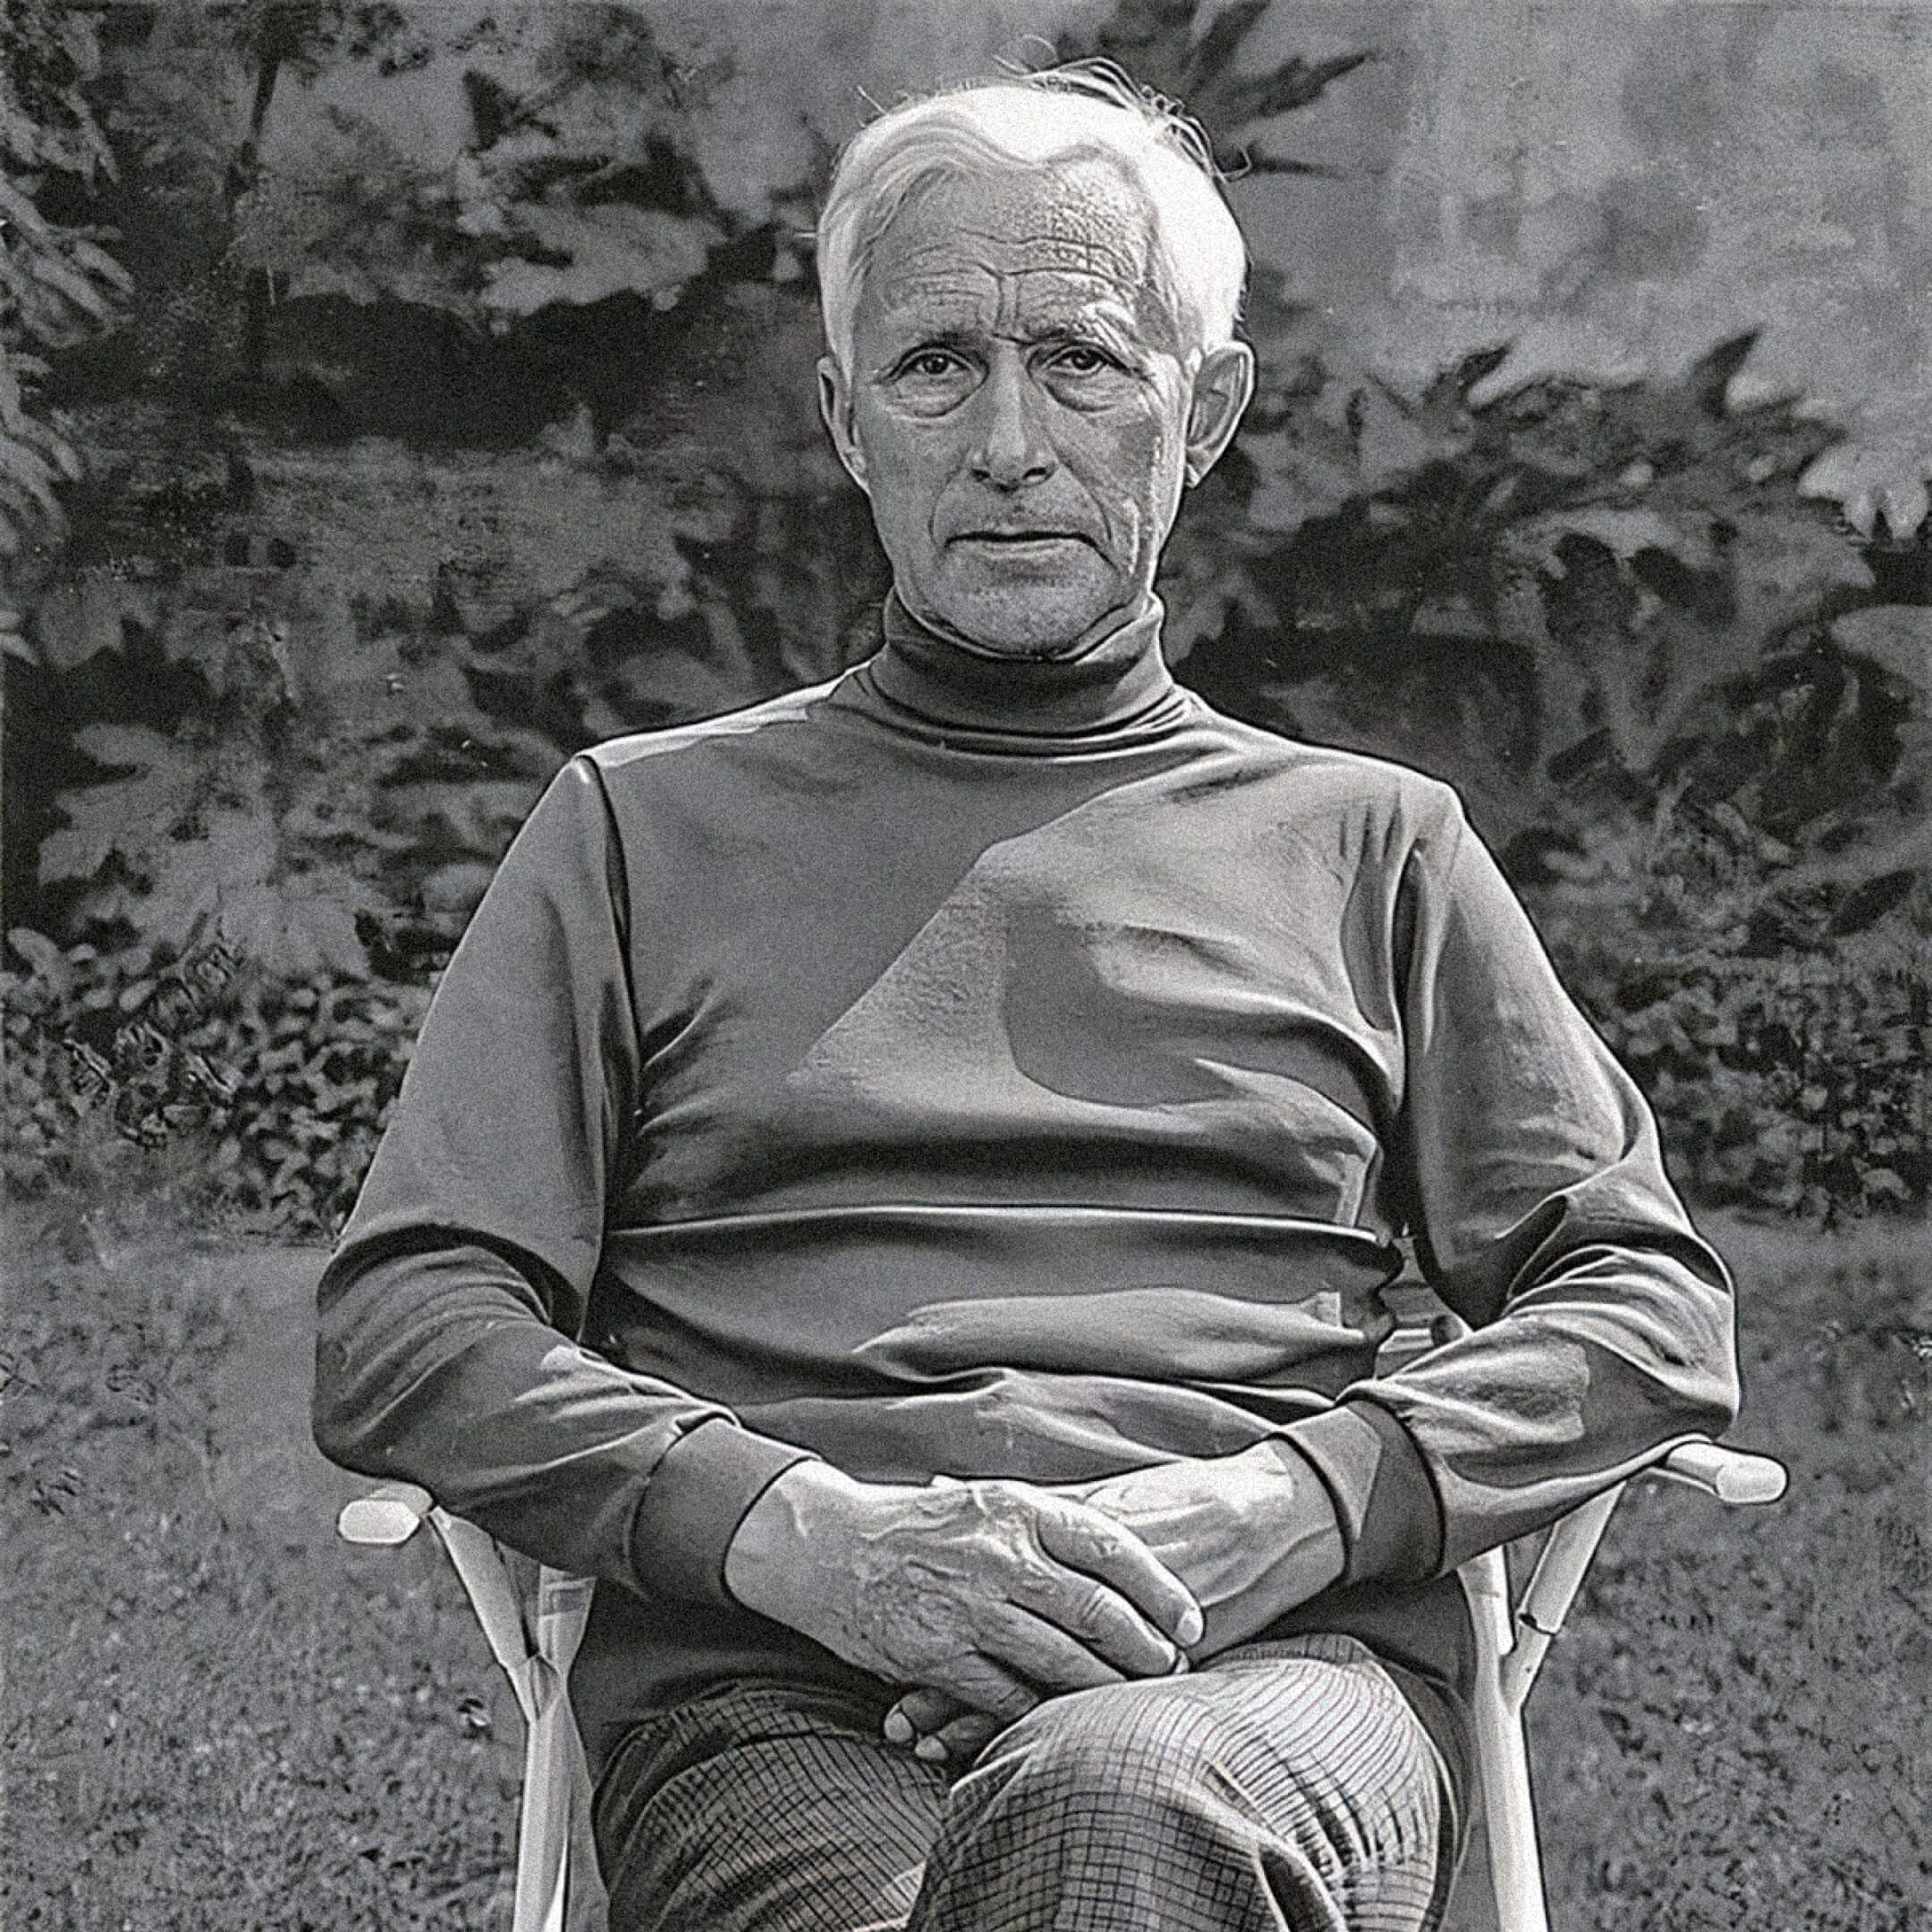 Эрнст Юнгер, 1970год. Источник: Ullsteinbild / Keystone